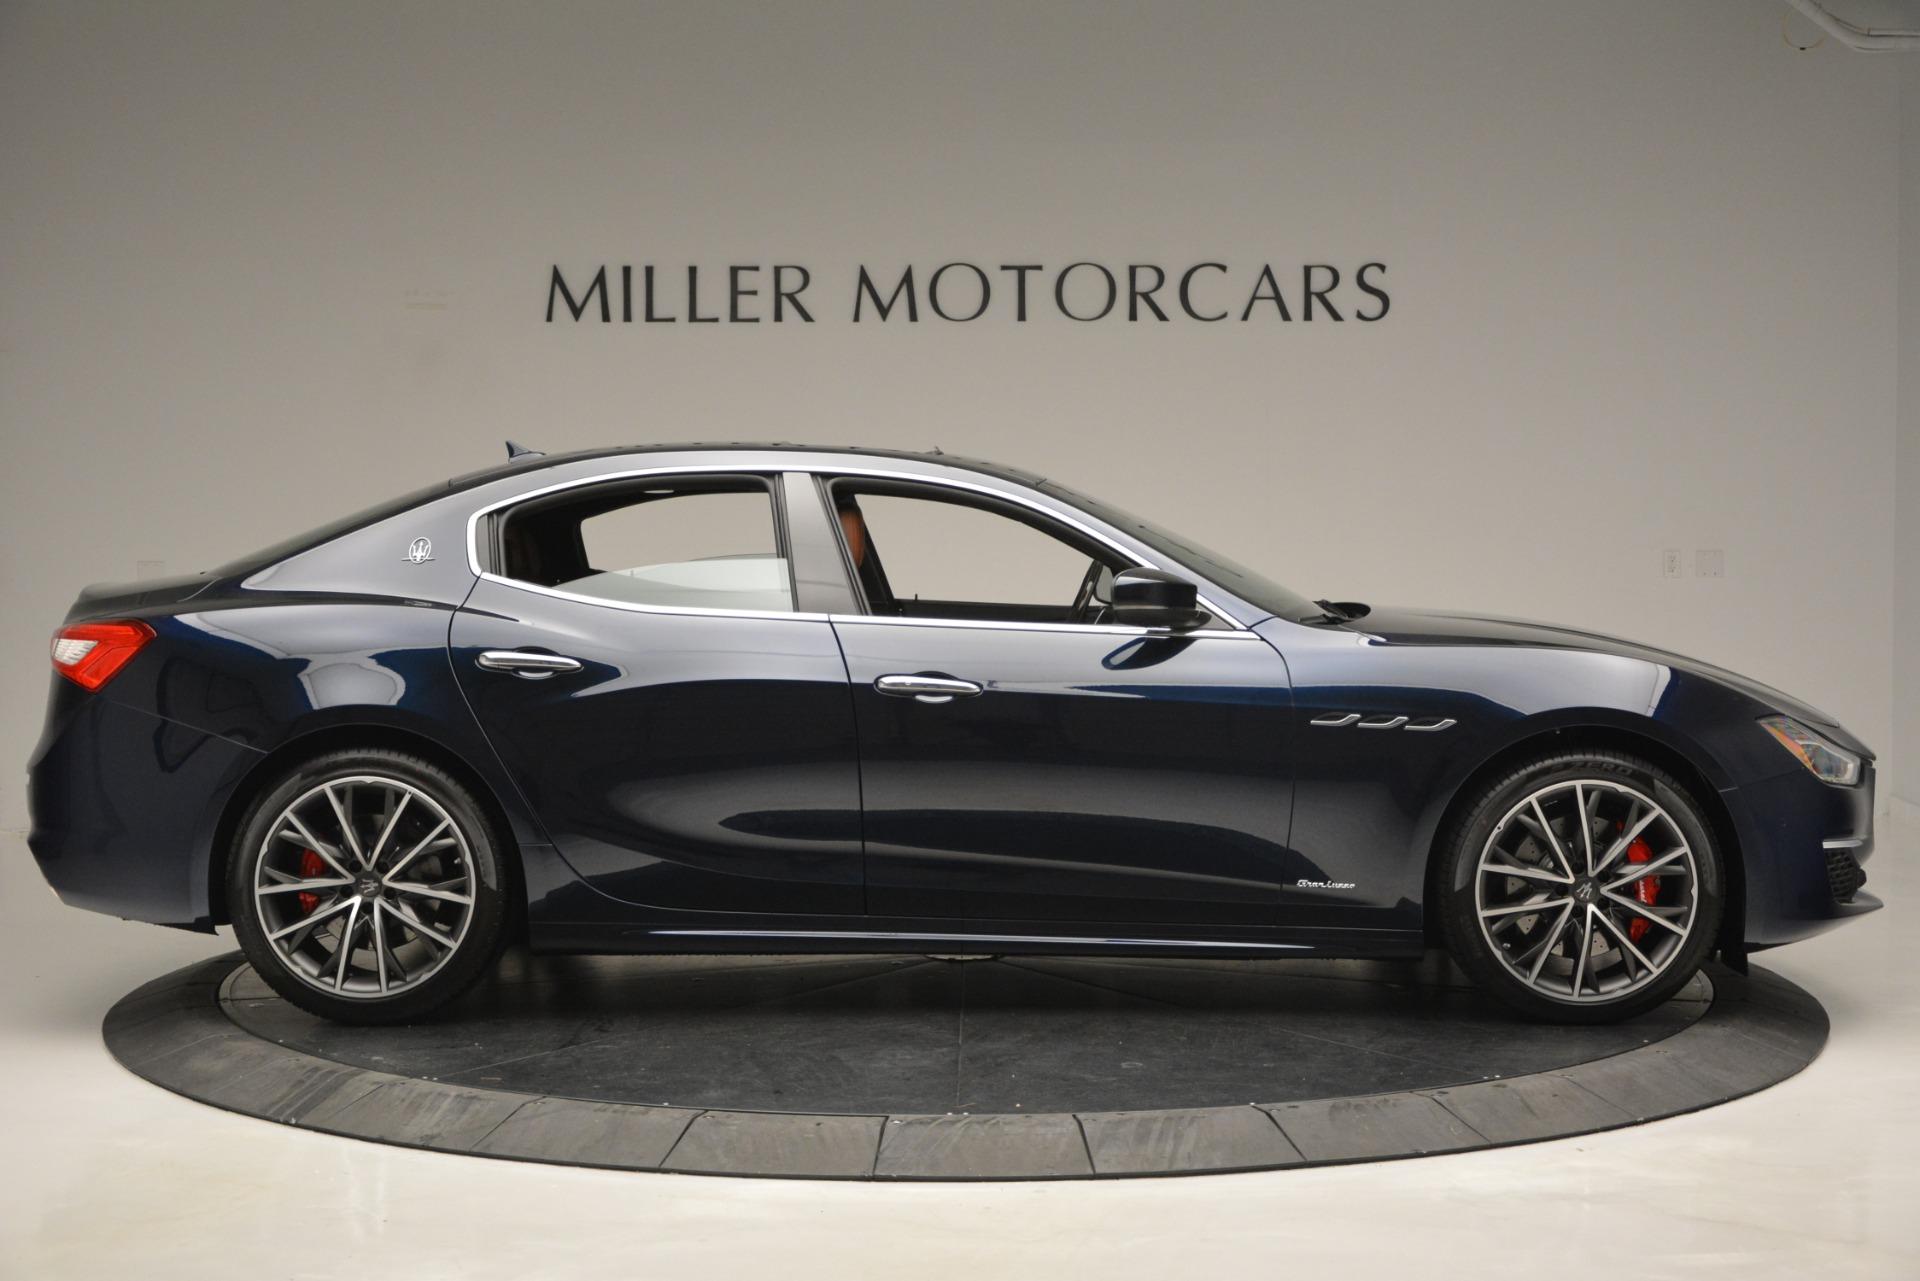 New 2019 Maserati Ghibli S Q4 GranSport For Sale In Greenwich, CT 2948_p13